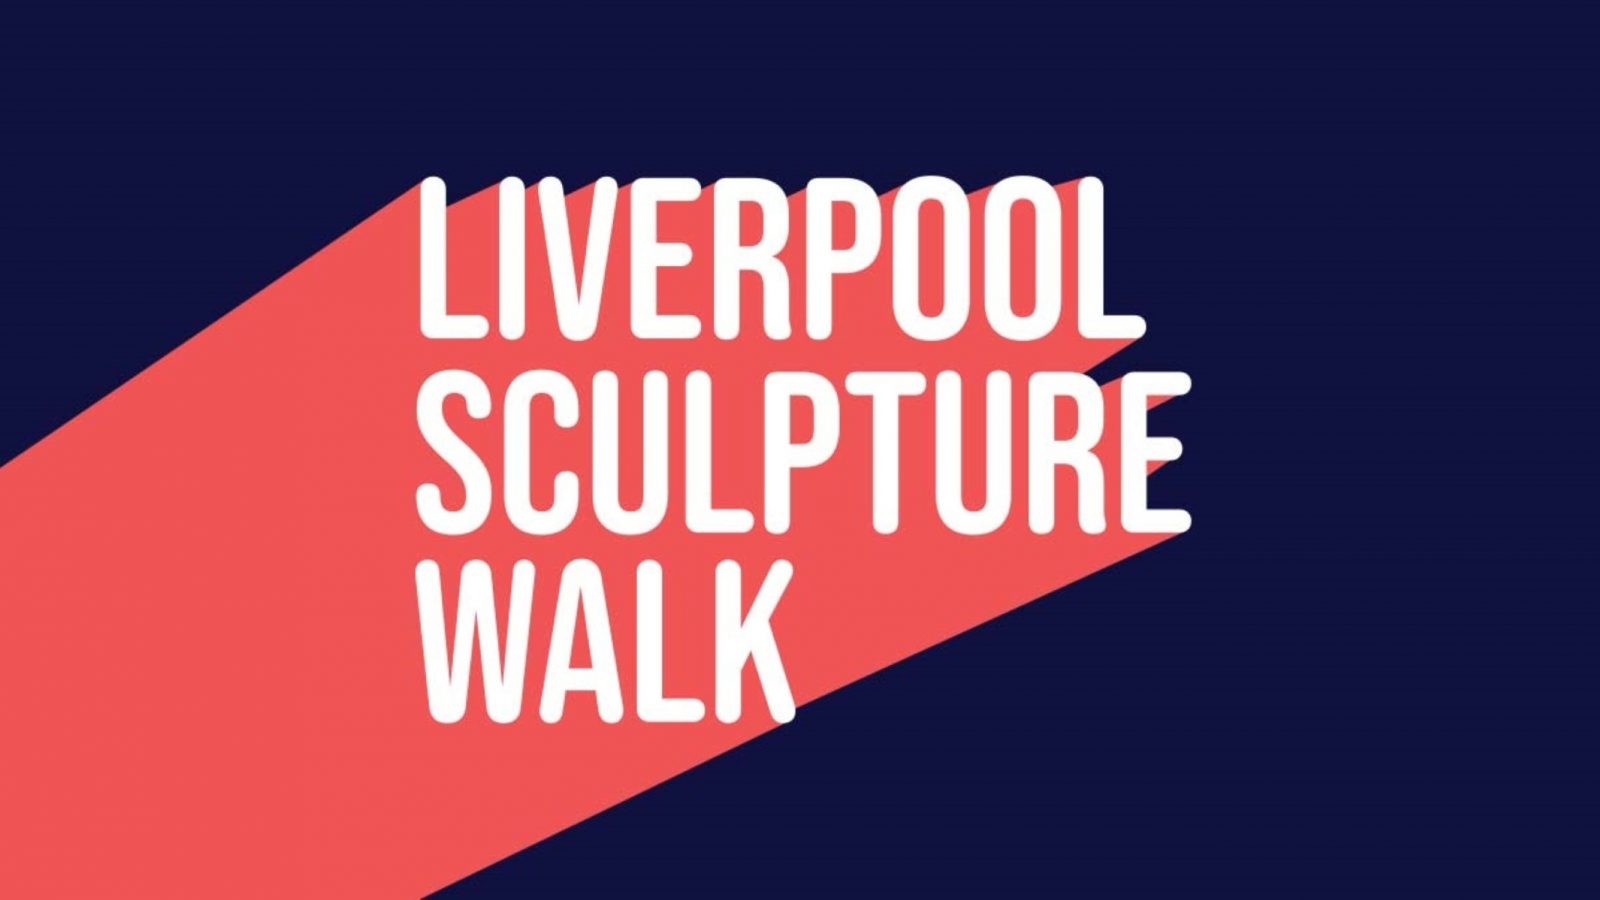 Liverpool Sculpture Walk